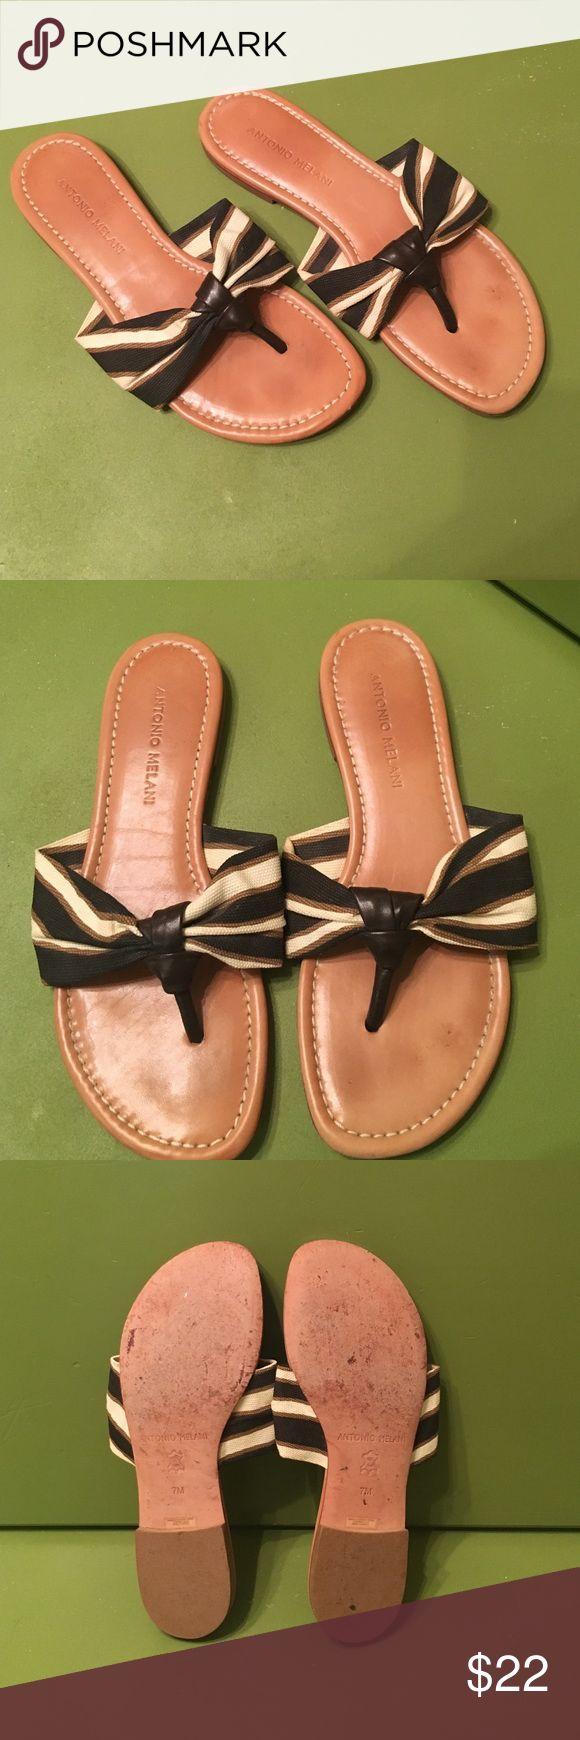 Antonio Melani sandals size 7 Antonio Melani sandals size 7. Great used condition! Only worn a few short times. ANTONIO MELANI Shoes Sandals